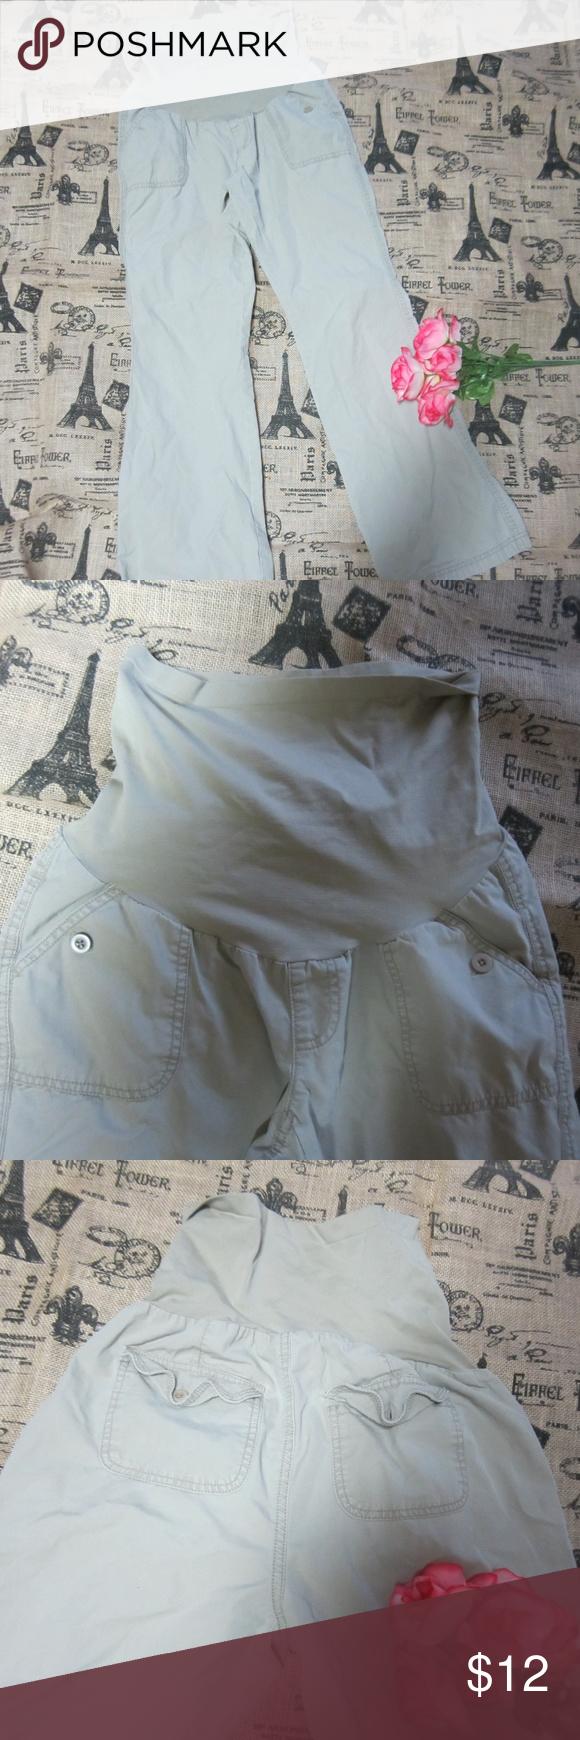 ab17212011c45 Oh baby by Motherhood Maternity S khaki tan Jeans Oh Baby by Motherhood  Maternity Size Small Khaki Tan Jeans Secret belly elastic waist, side  button pockets ...